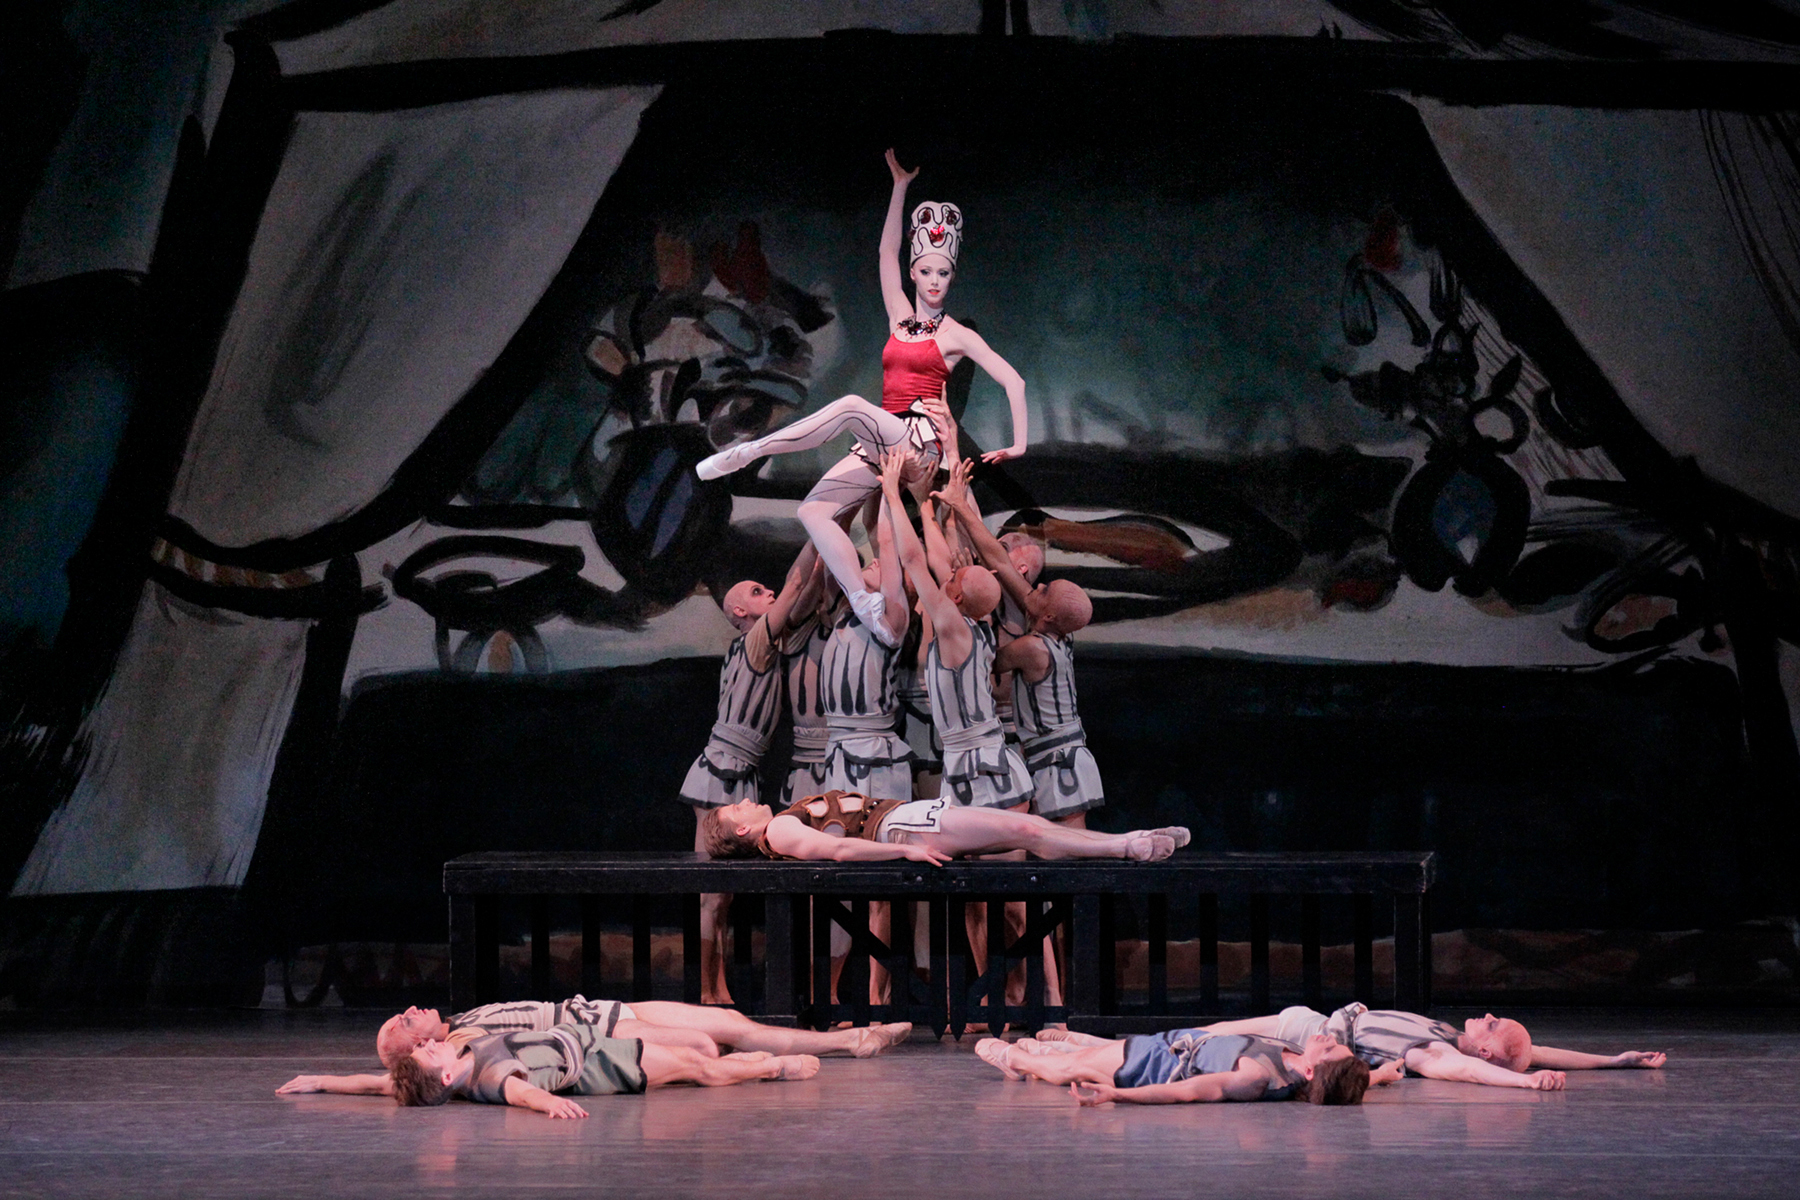 The prodigal son george Balanchine nyc ballet